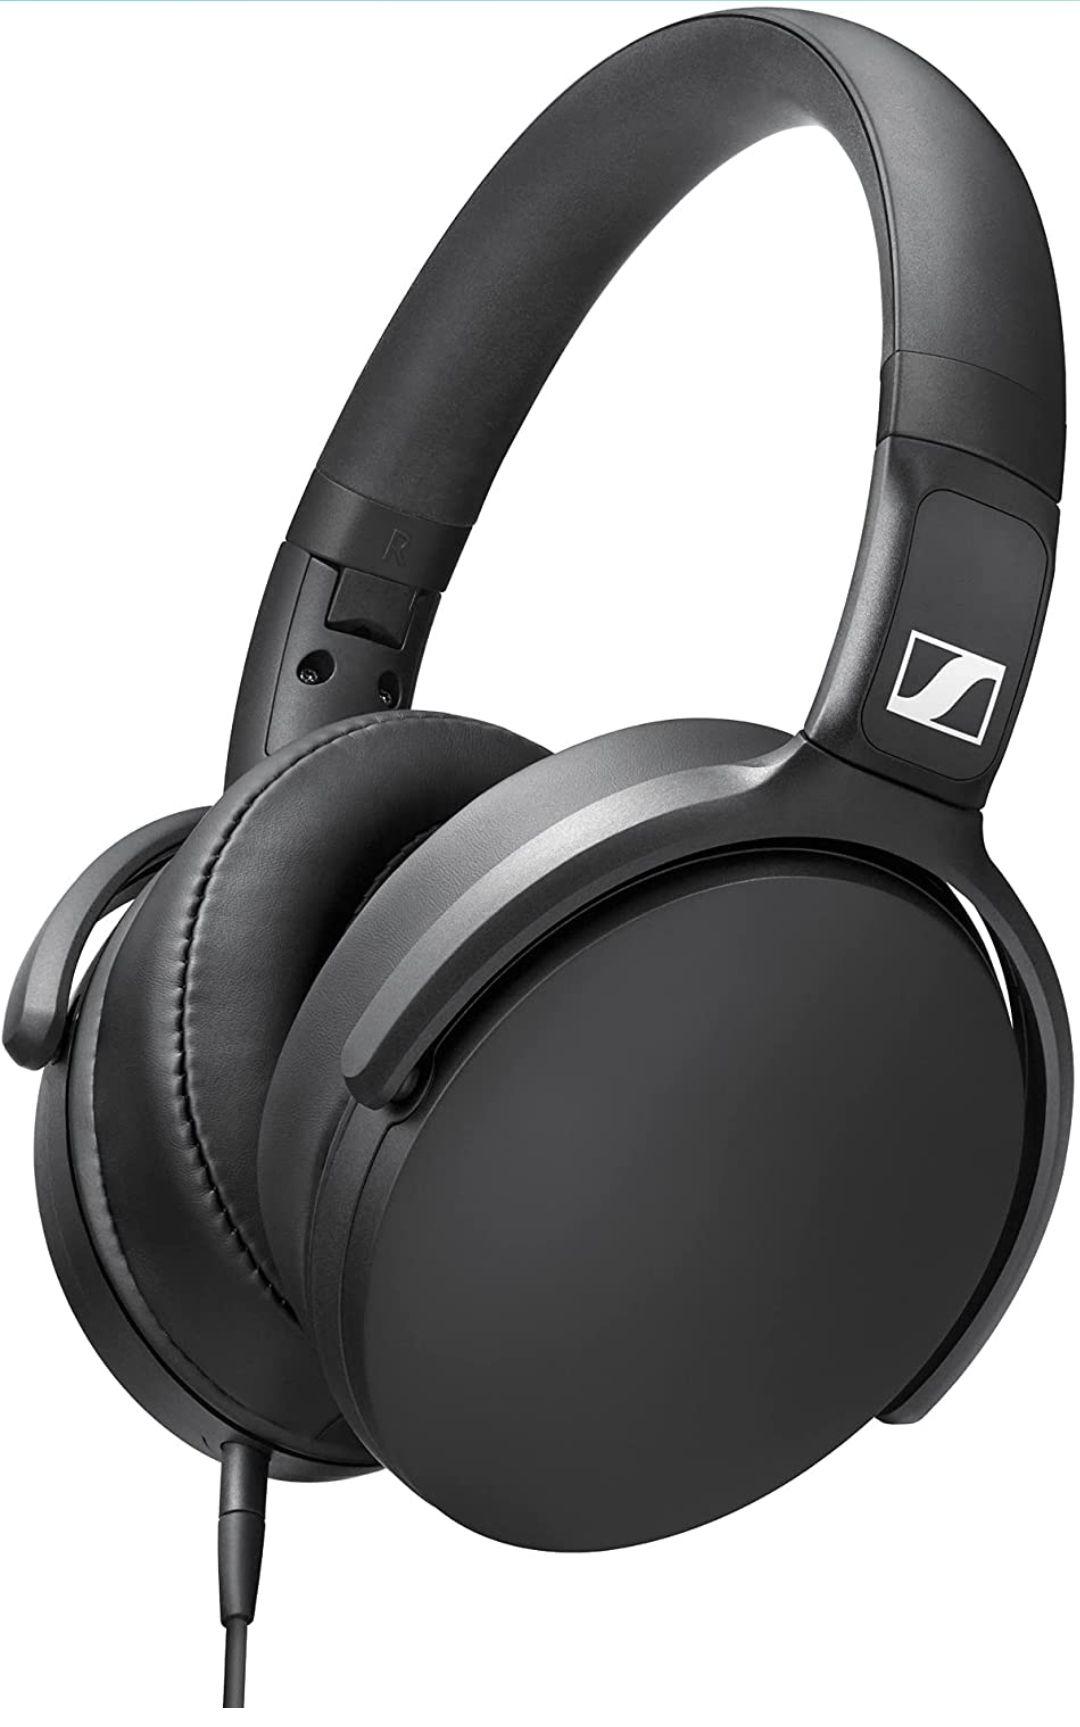 Sennheiser HD 400S - Over-Ear Headphone with Smart Remote, Black - £41.94 @ Amazon